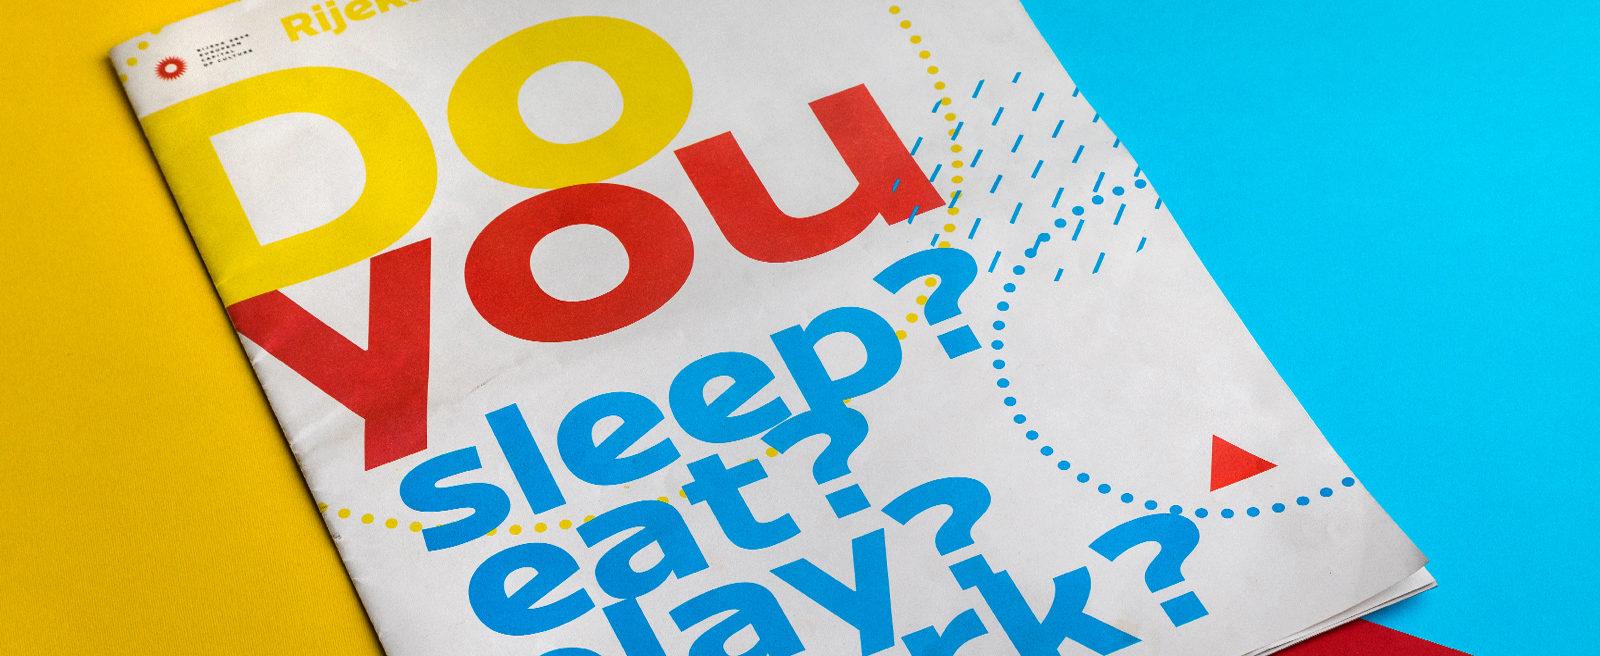 Do you sleep? eat? play? work?